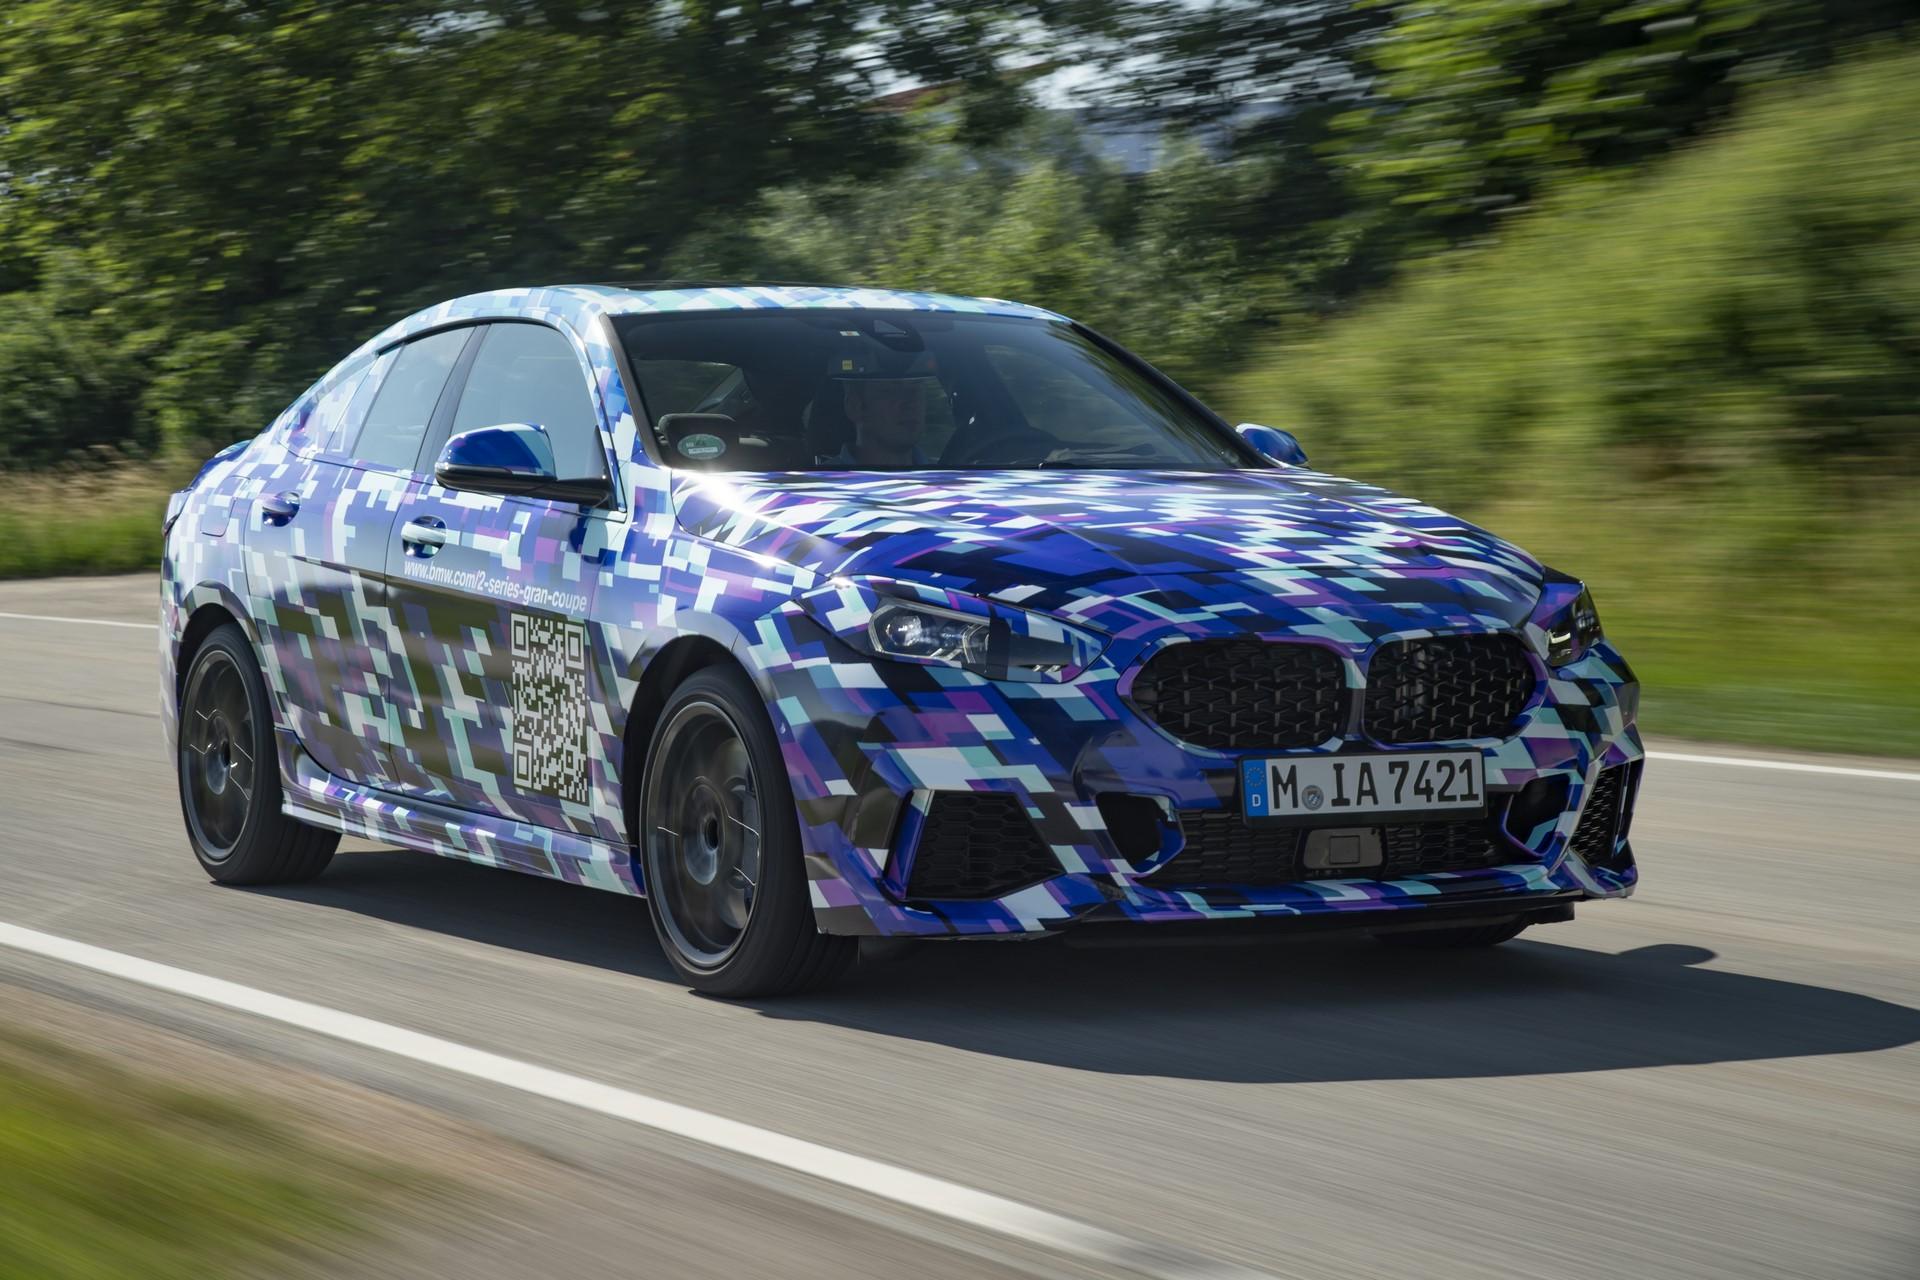 BMW-2-Series-Gran-Coupe-2020-spy-photos-26